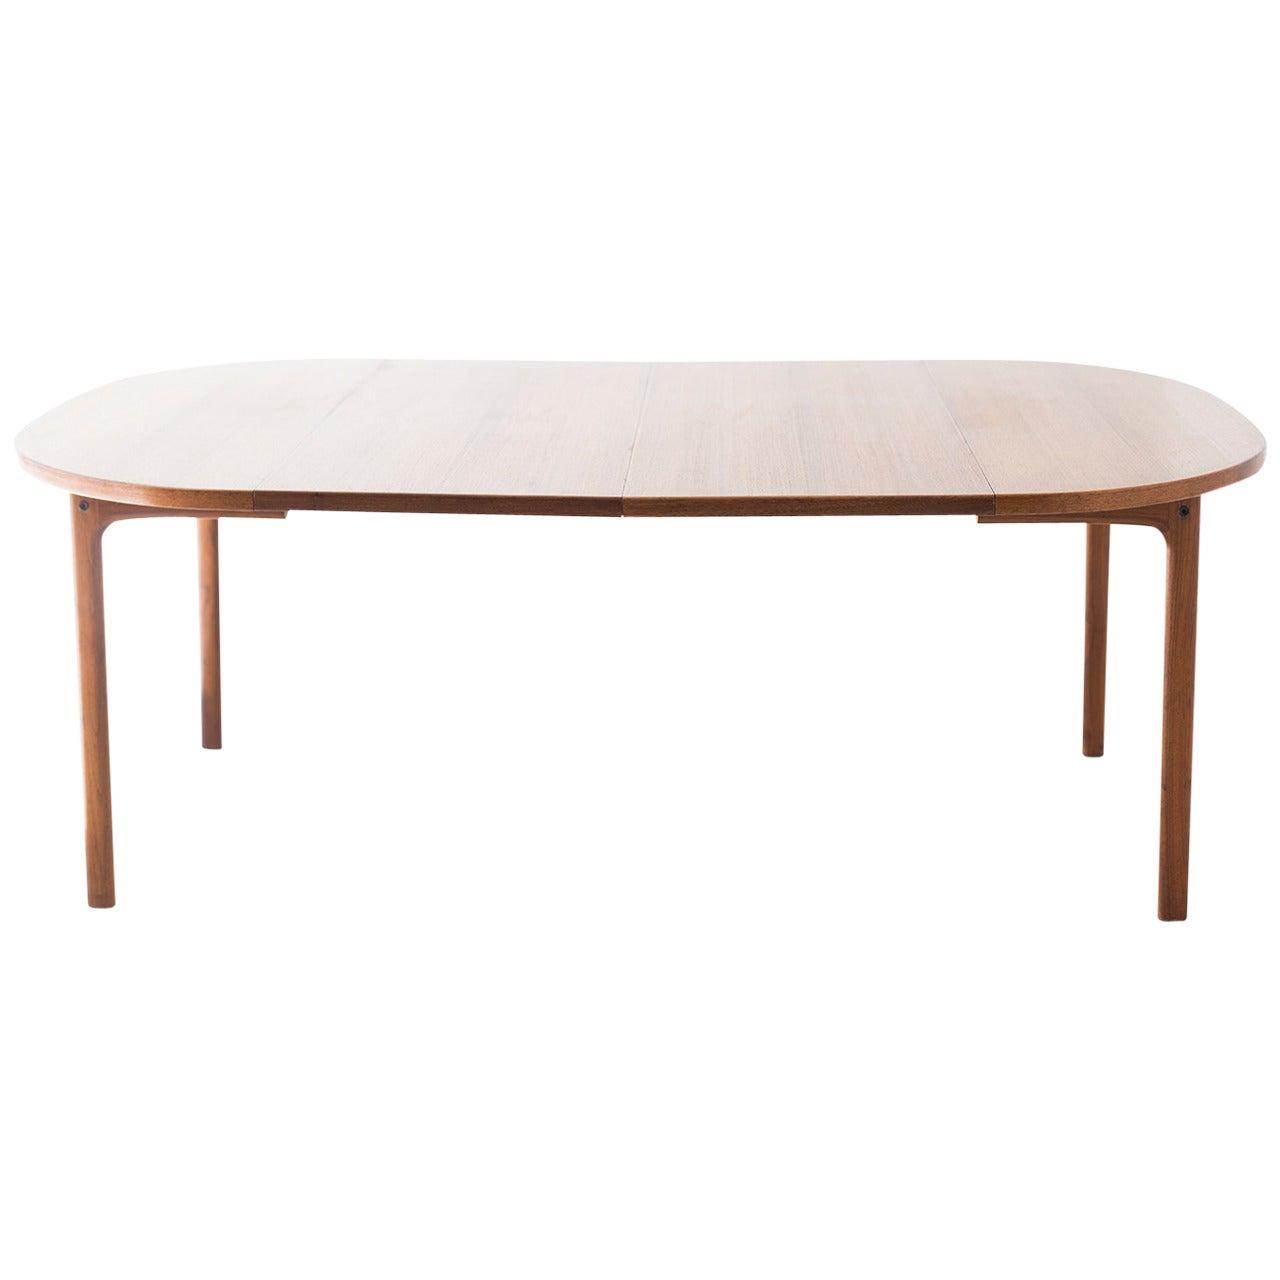 Folke Ohlsson Dining Table for DUX